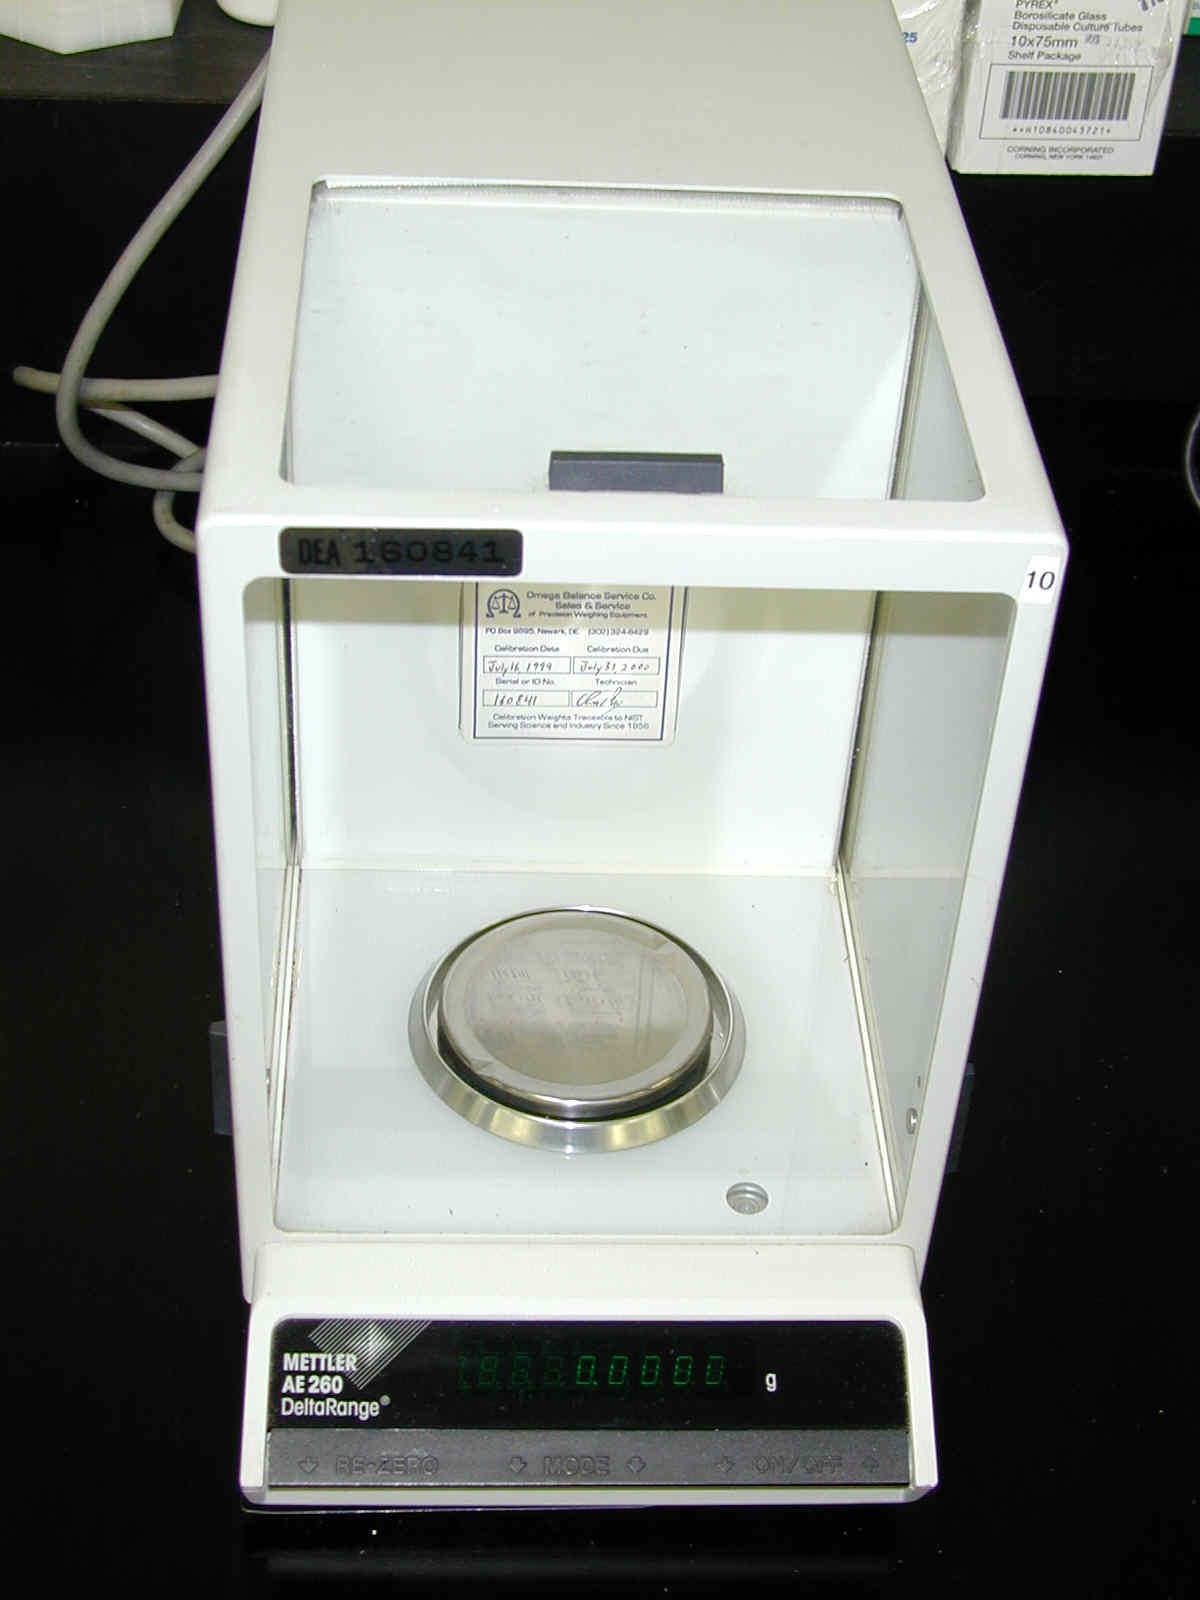 gravimetric determination of water in hydrated barium chloride